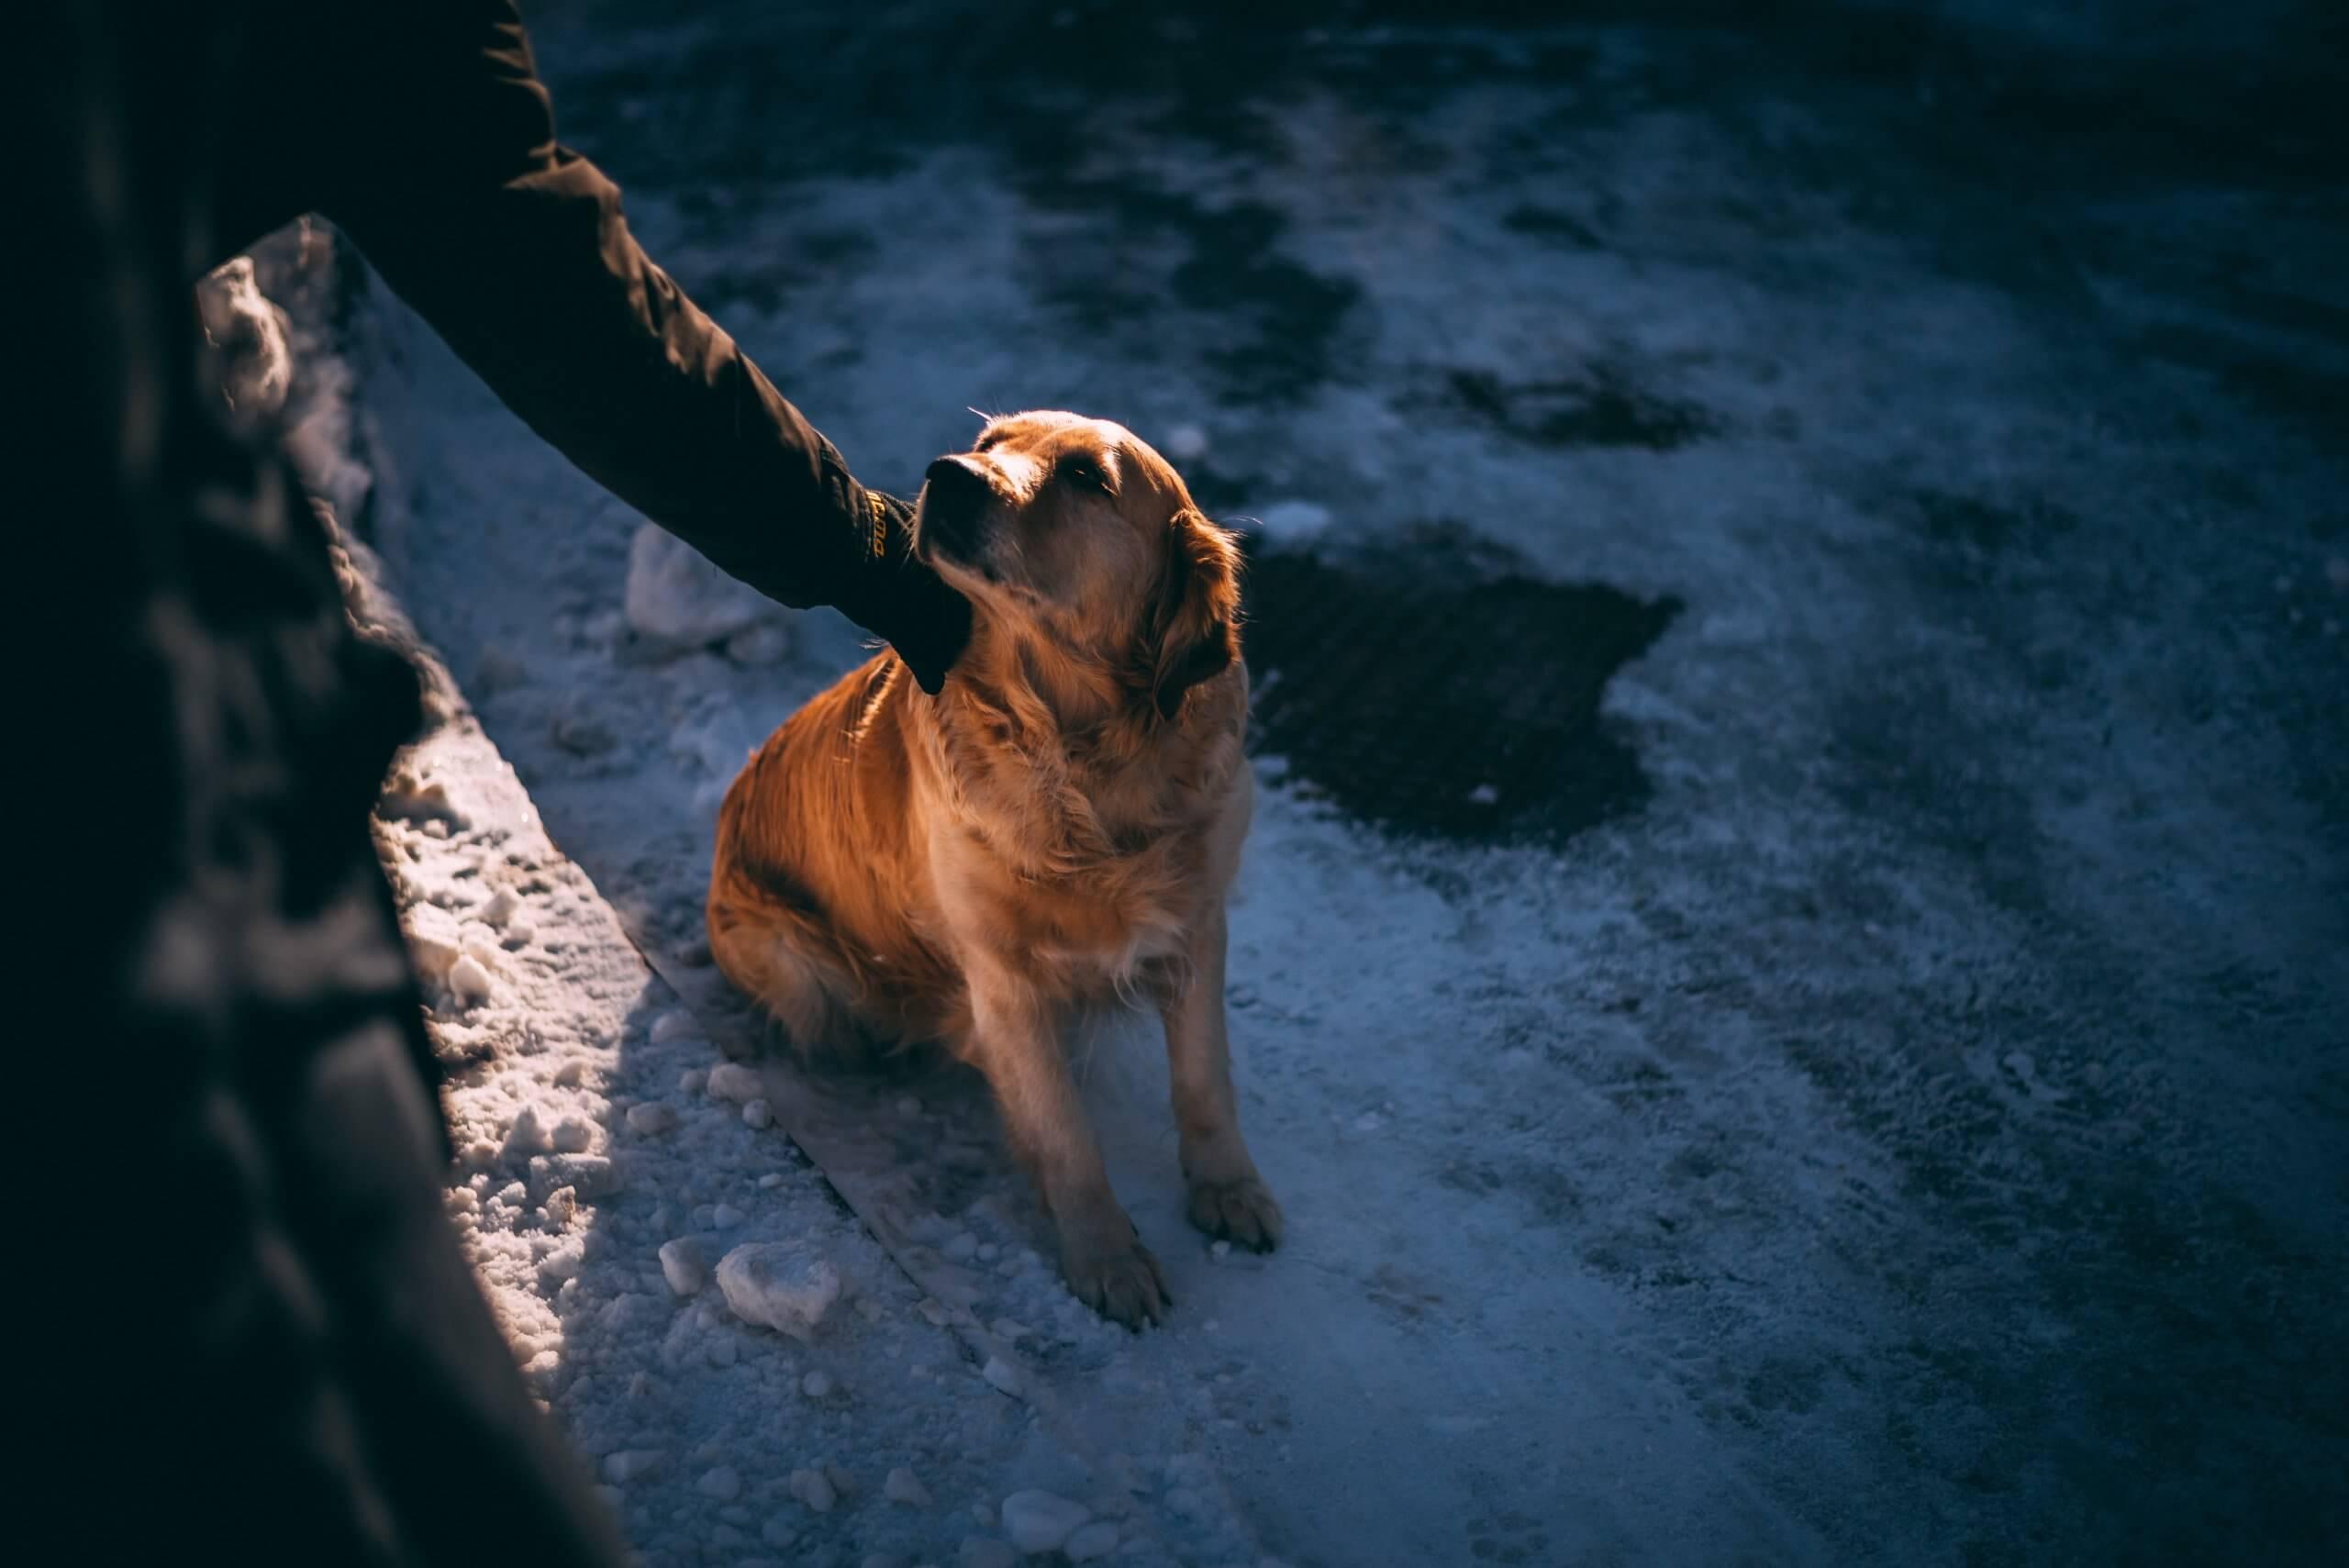 beneficenza per cani